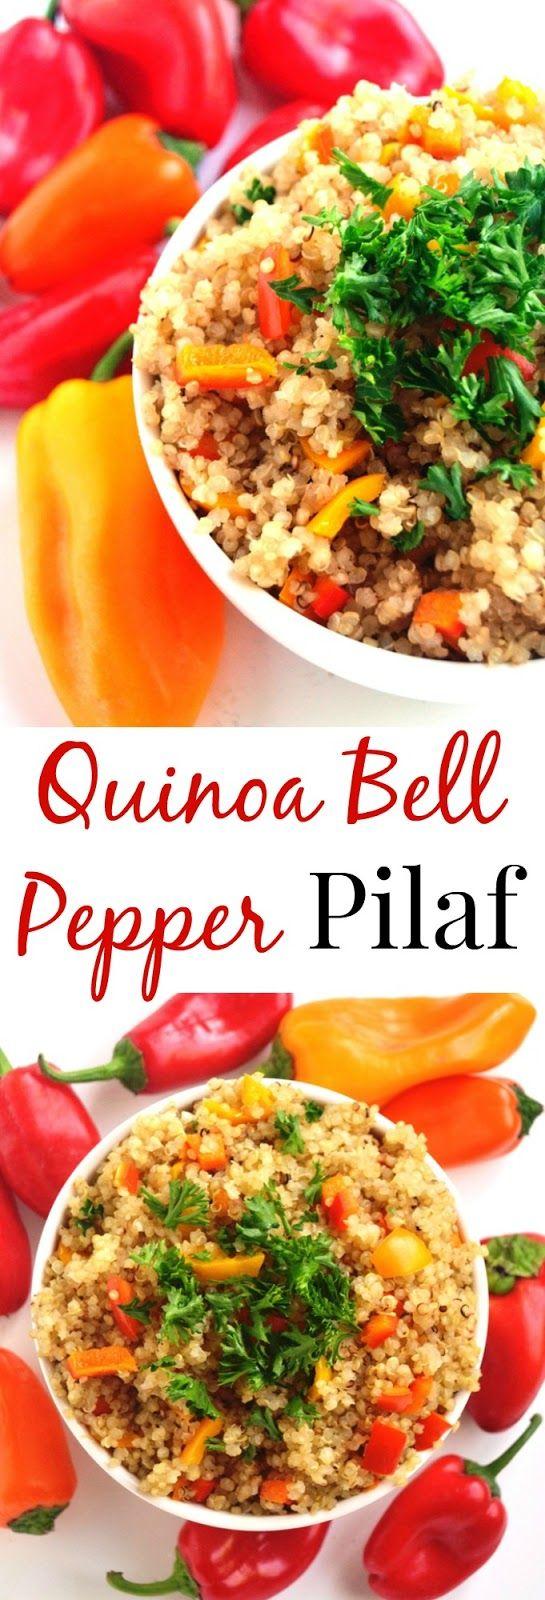 Quinoa Bell Pepper Pilaf